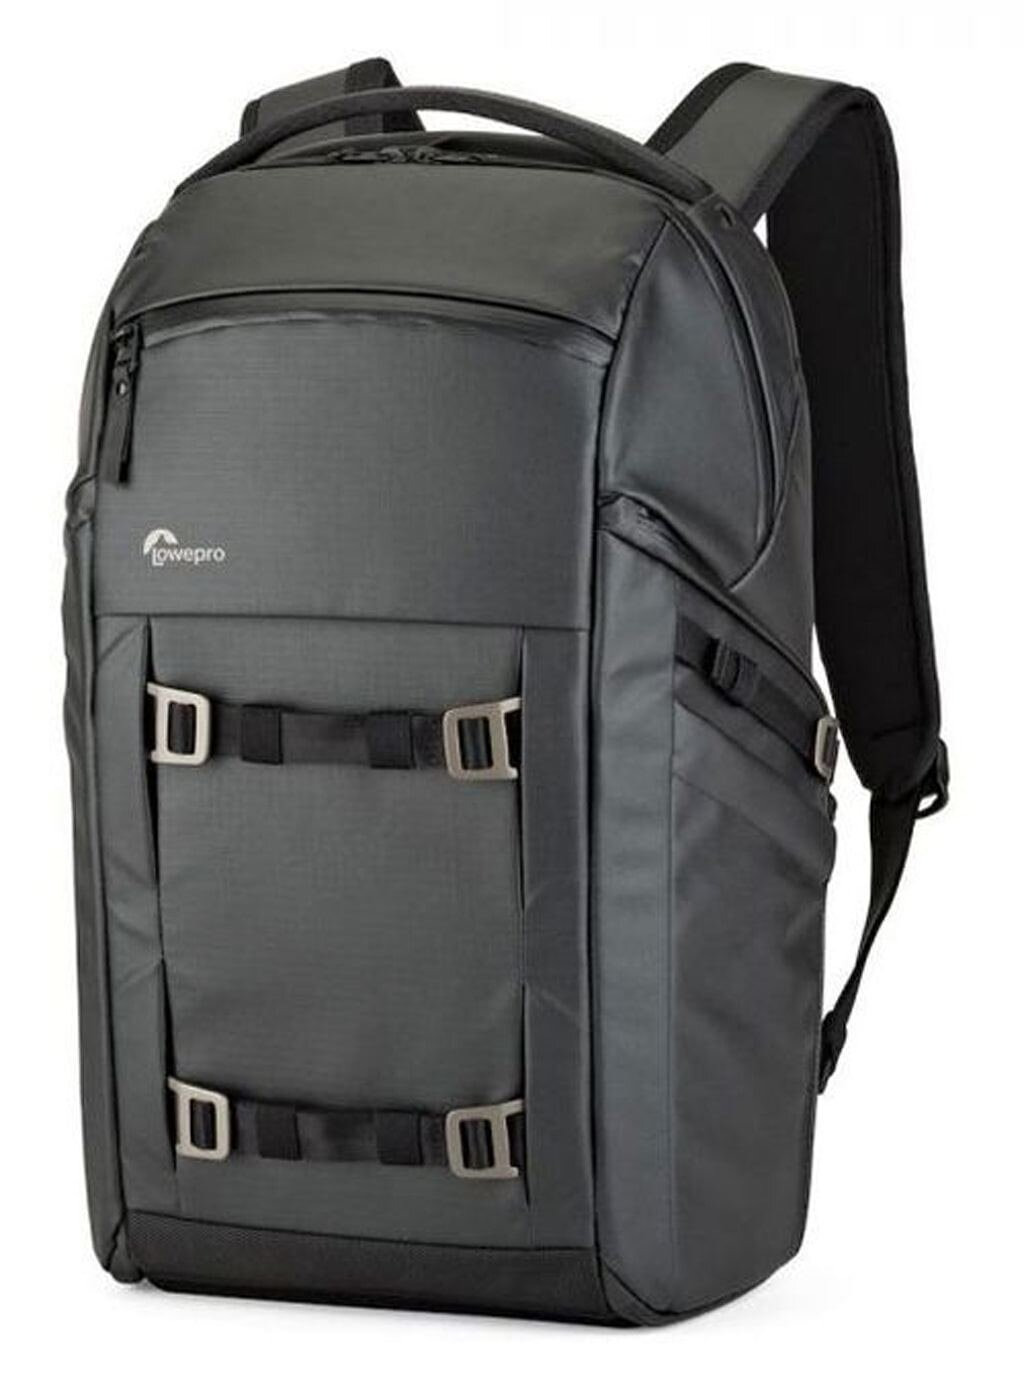 Lowepro Rucksack FreeLine BP 350 AW black